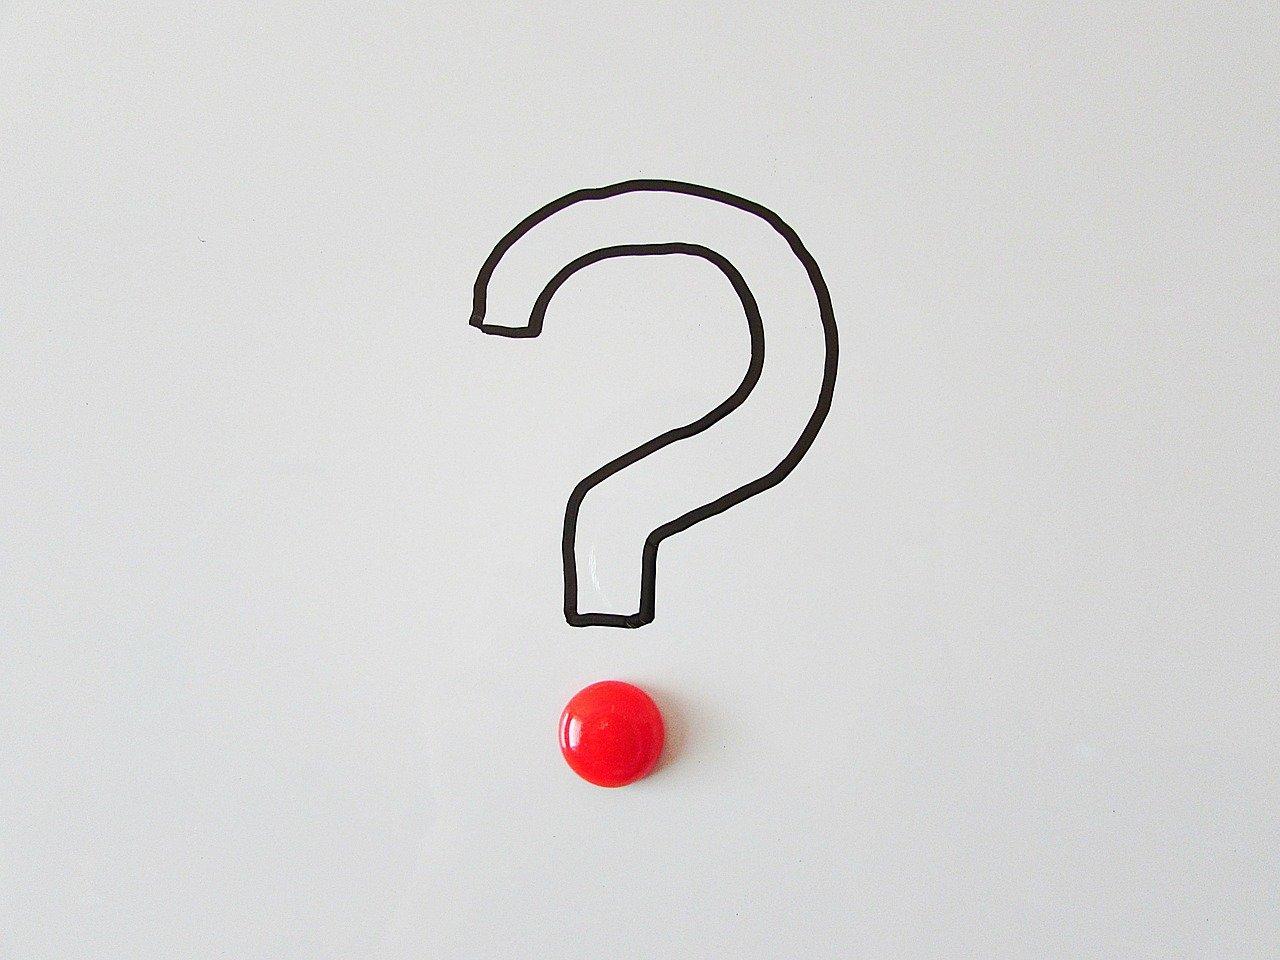 https://pixabay.com/photos/question-mark-question-symbol-463497/